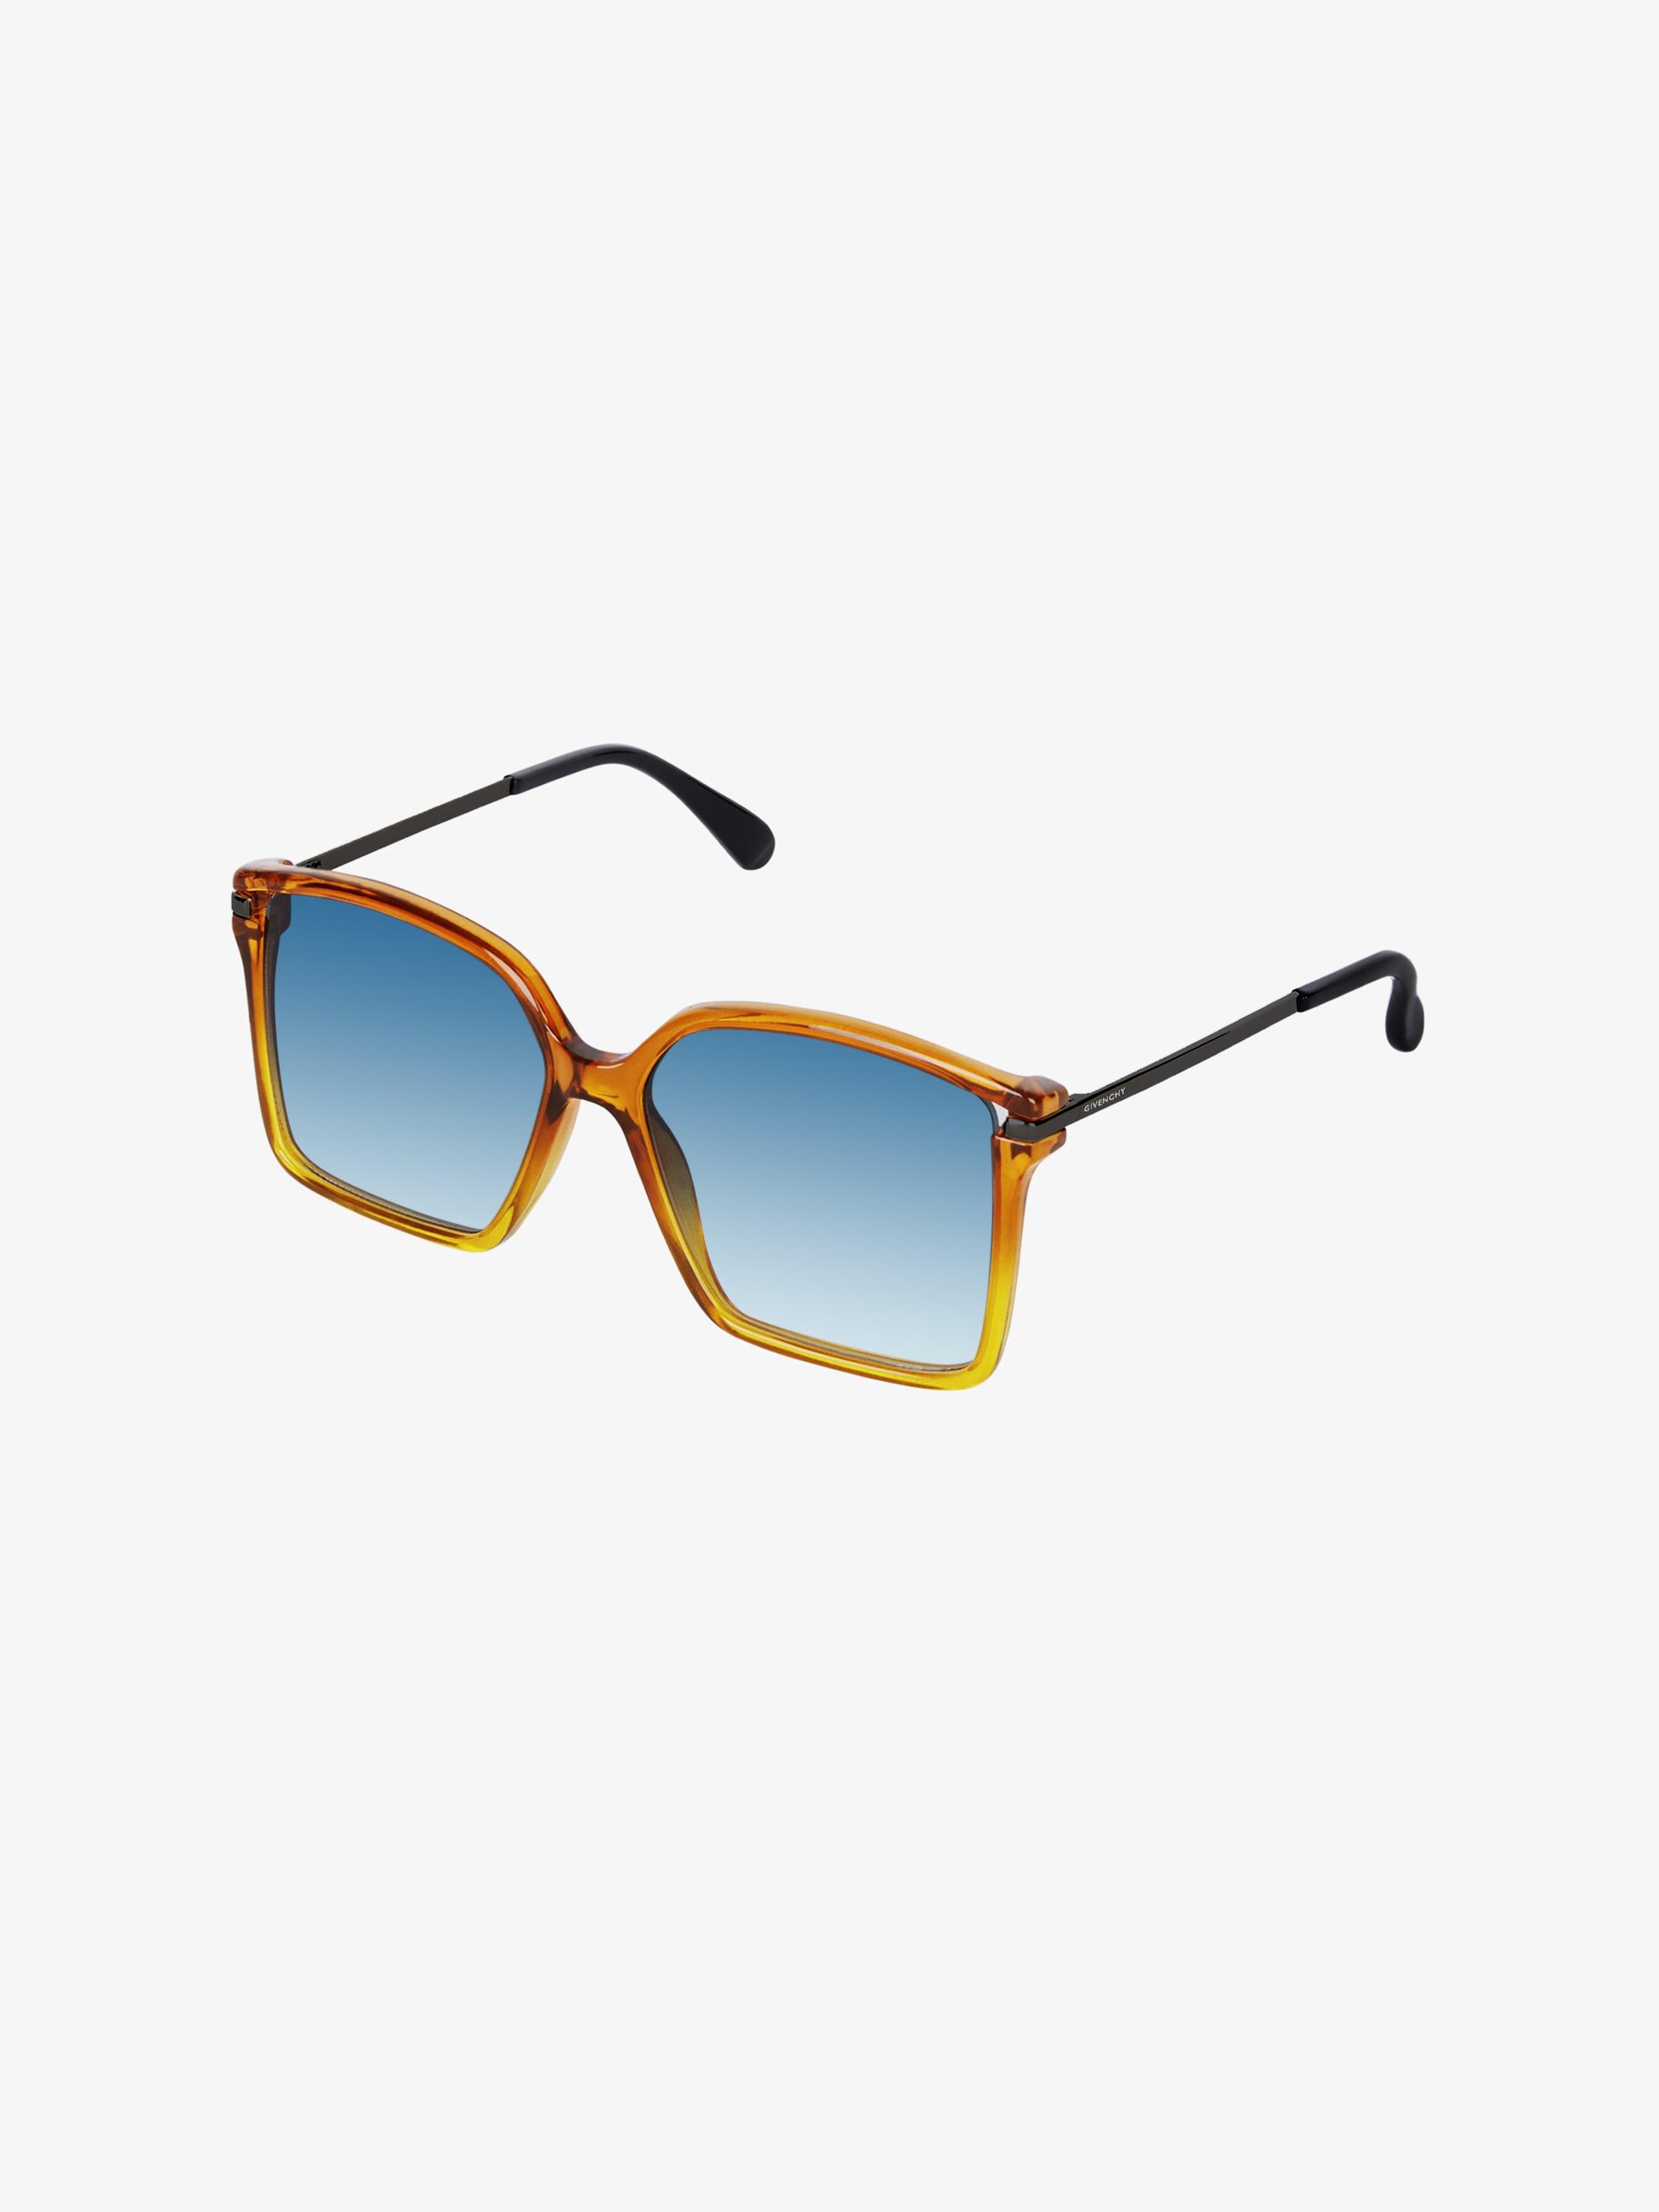 Square sunglasses in acetate and metal